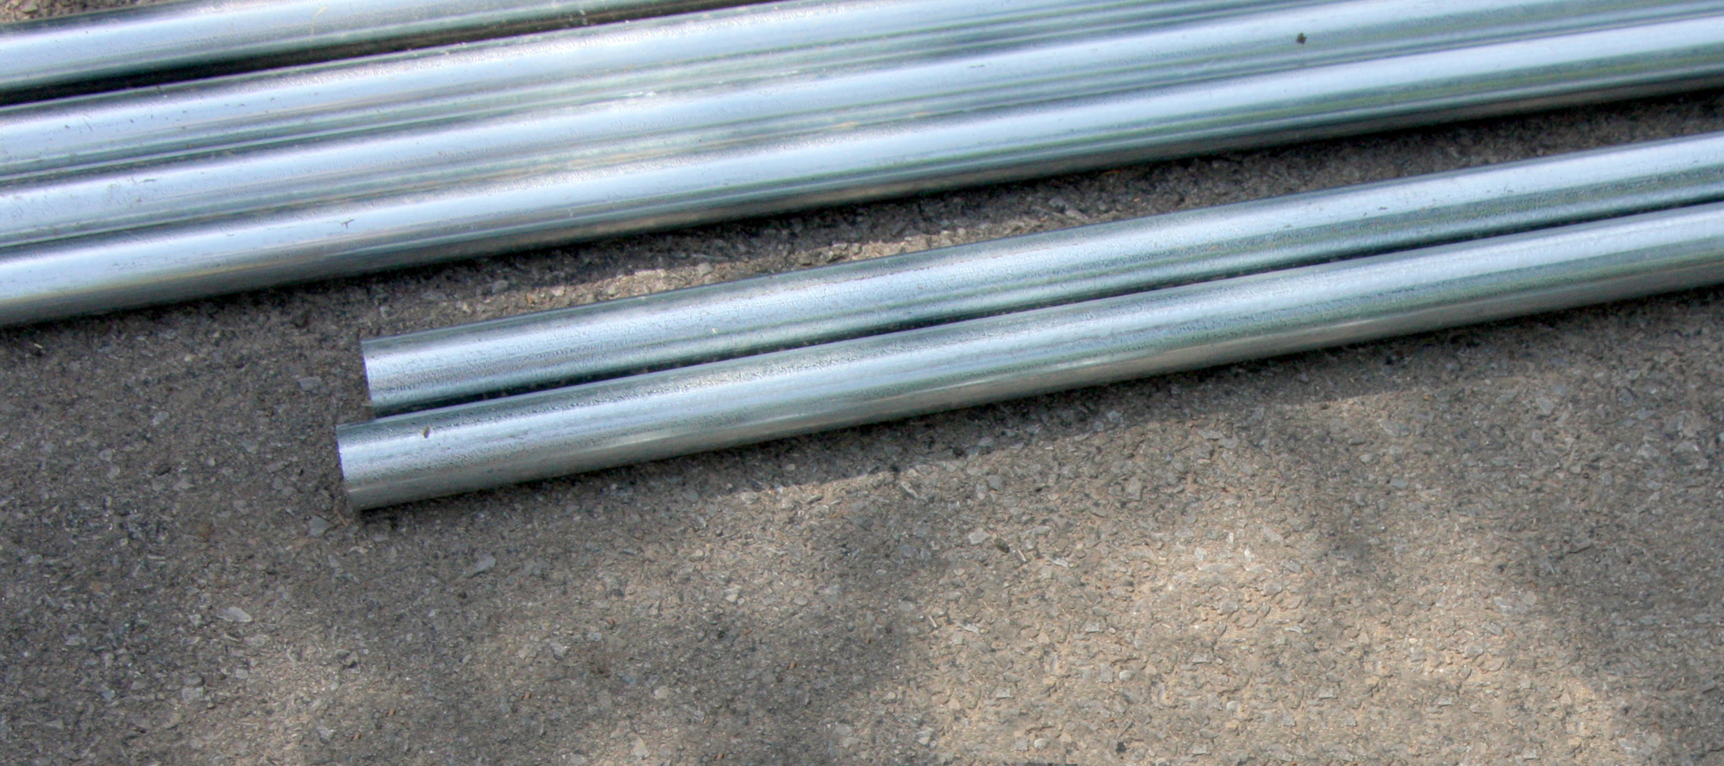 steel and aluminum pipe